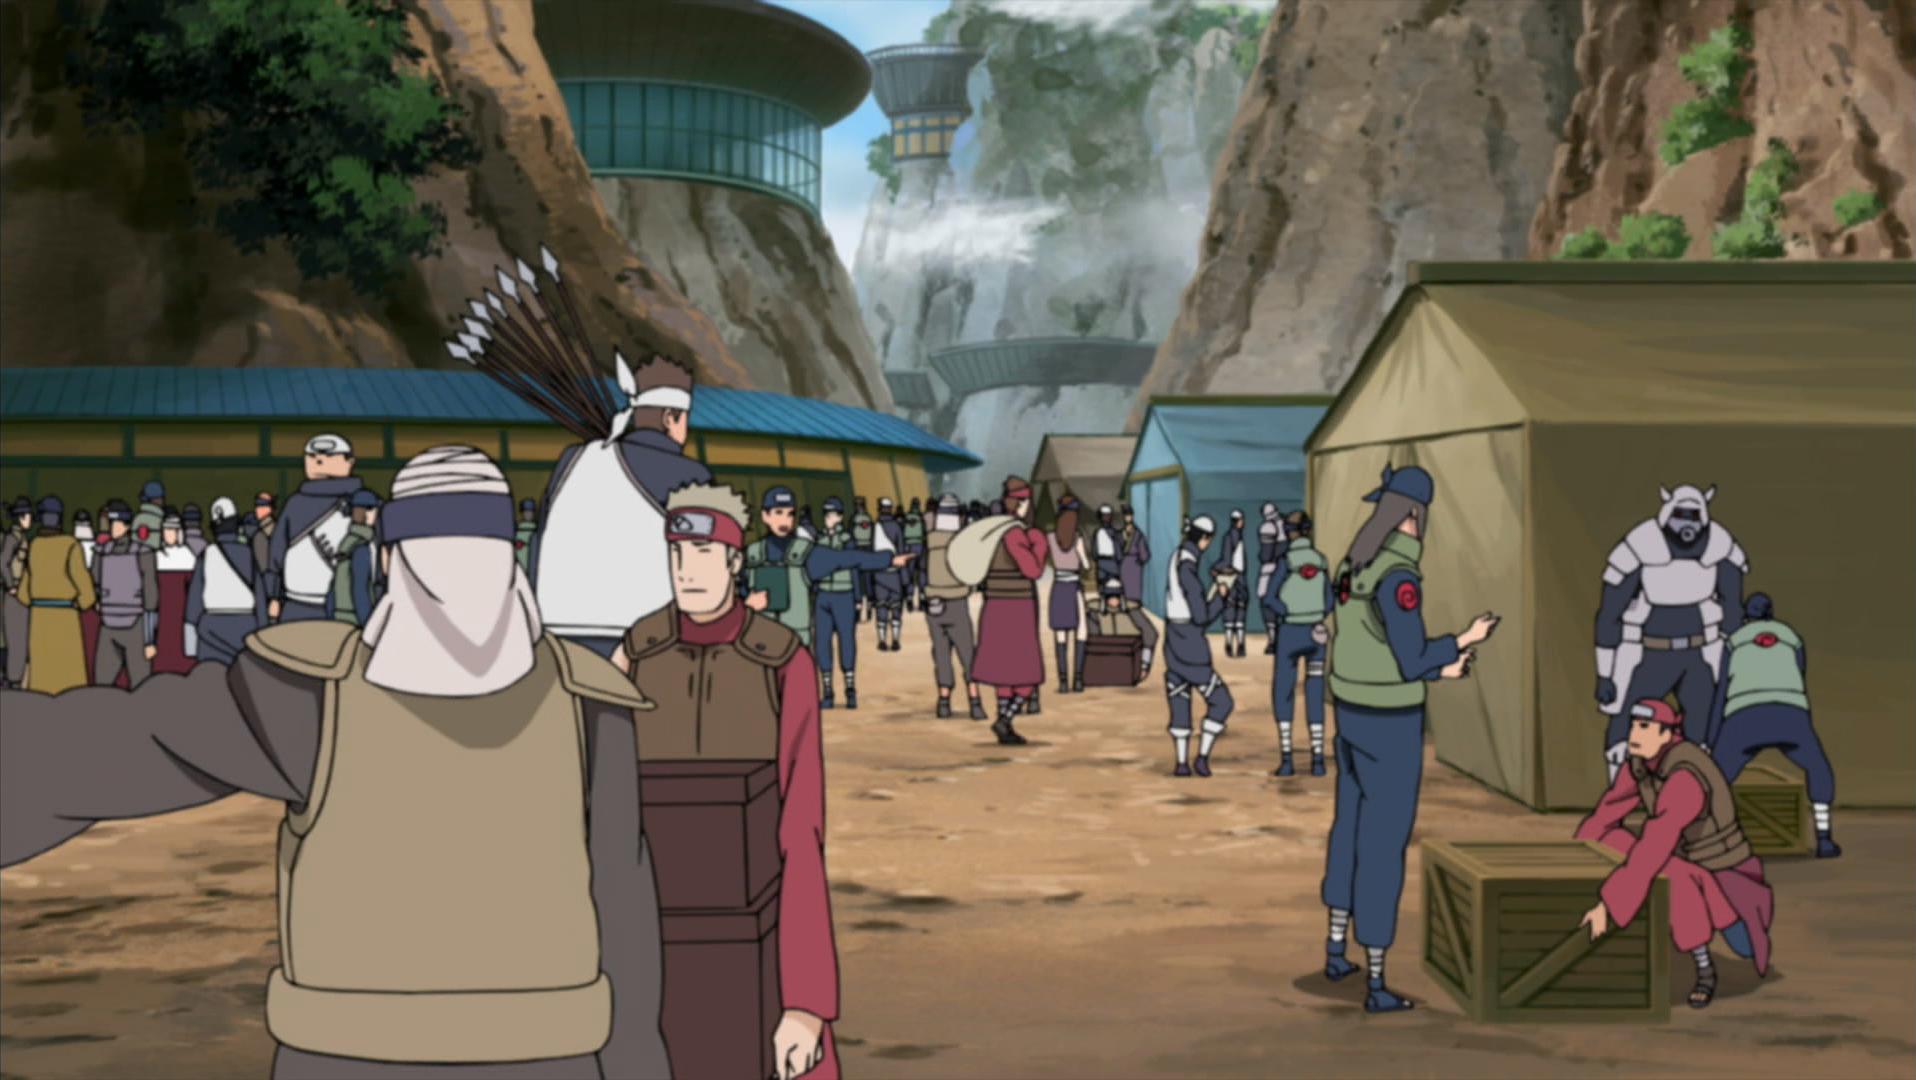 Allied Shinobi Forces